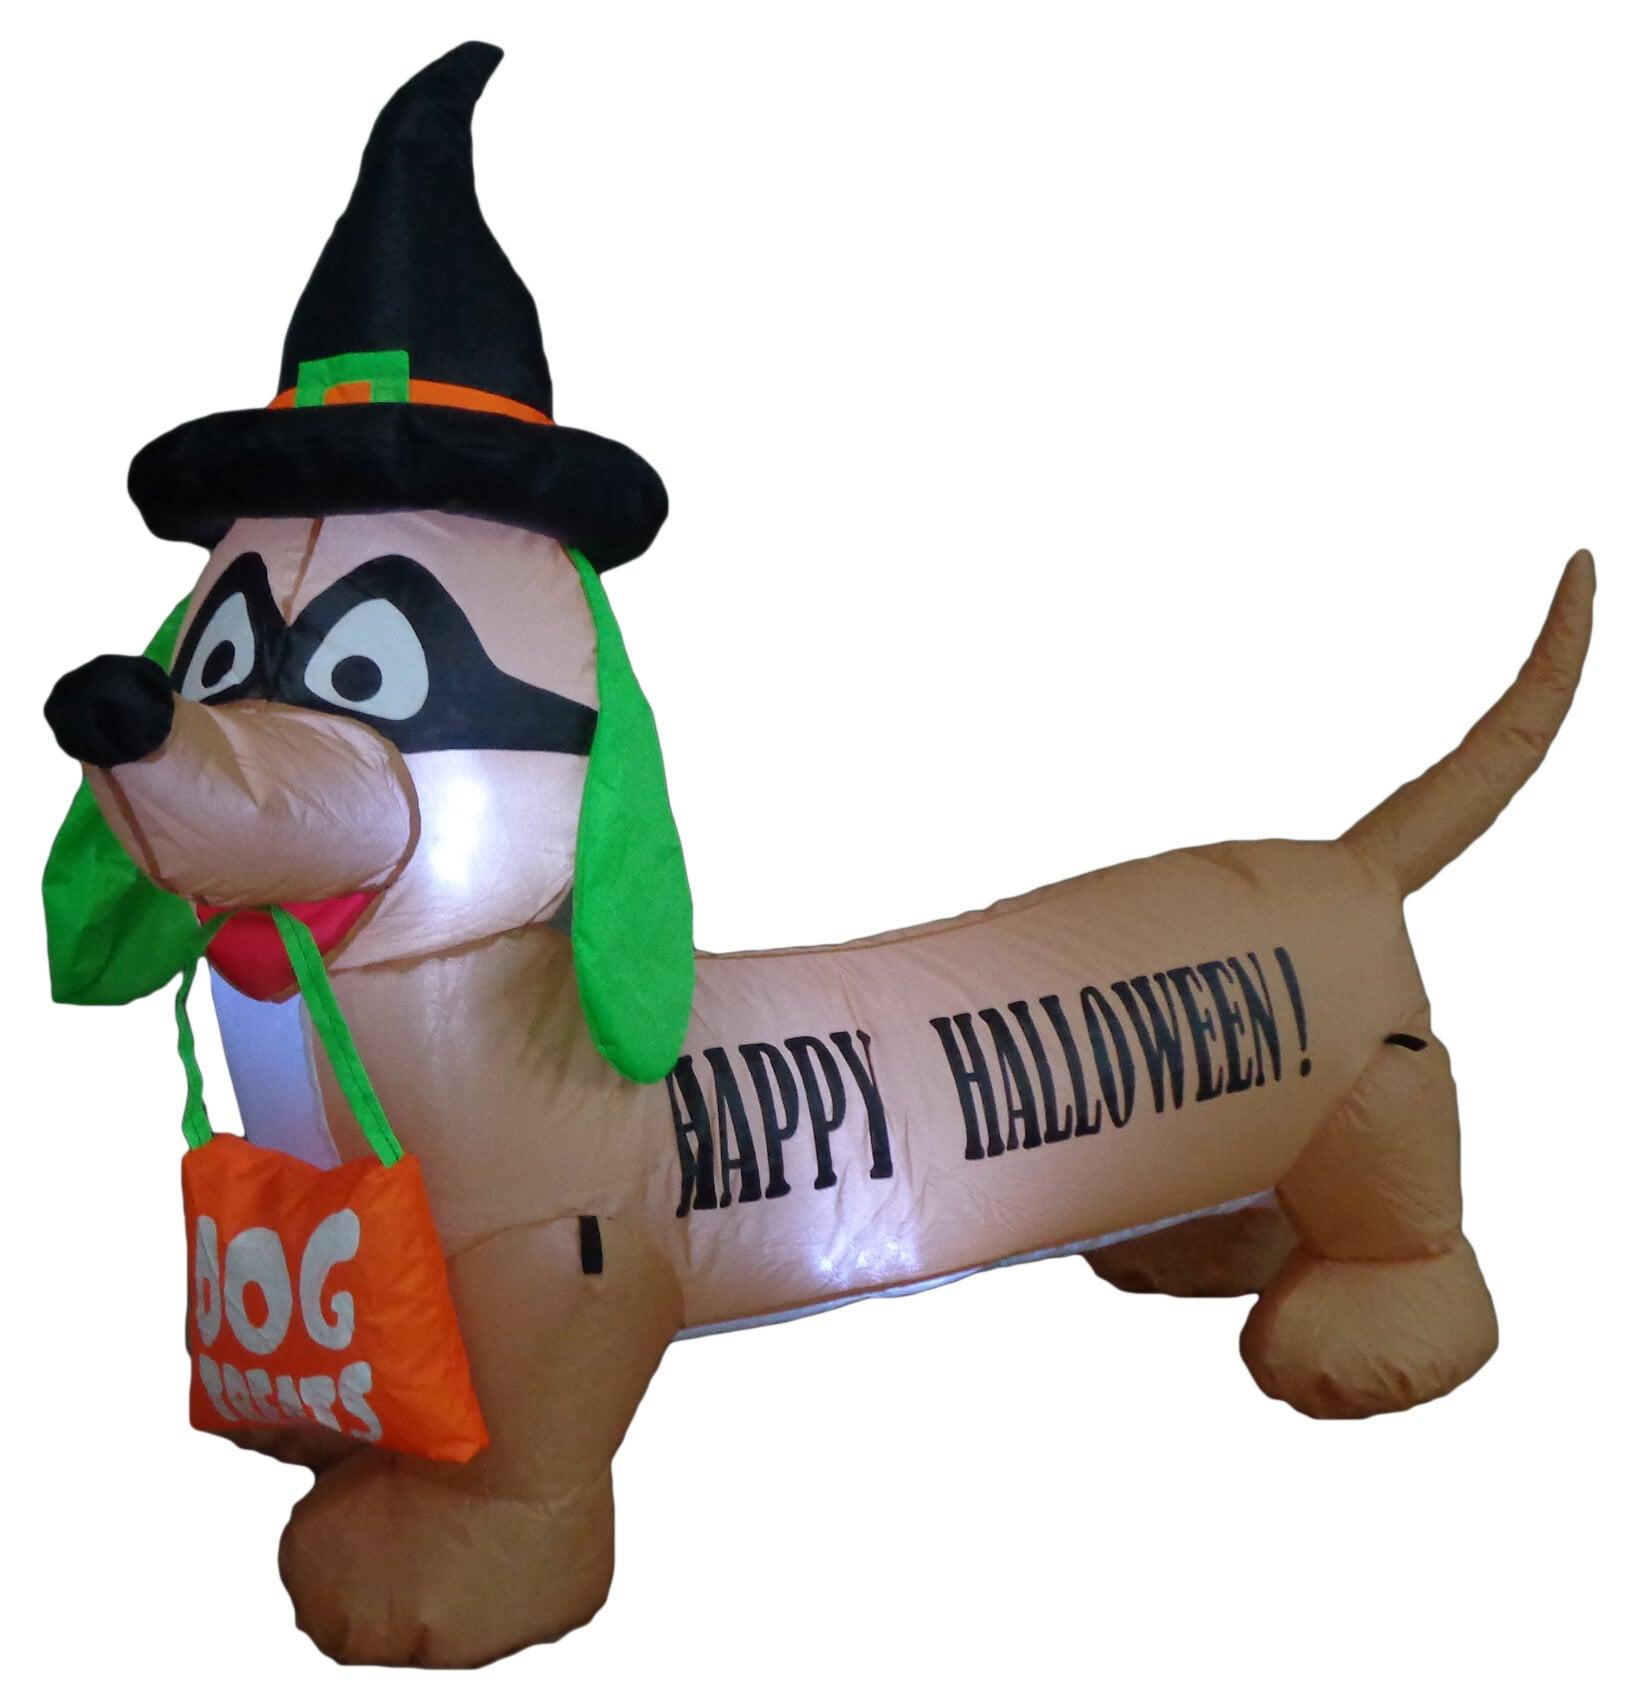 Dachshund Halloween Decorations.Shop The Cutest Halloween Decorations For Dog Lovers Popsugar Pets